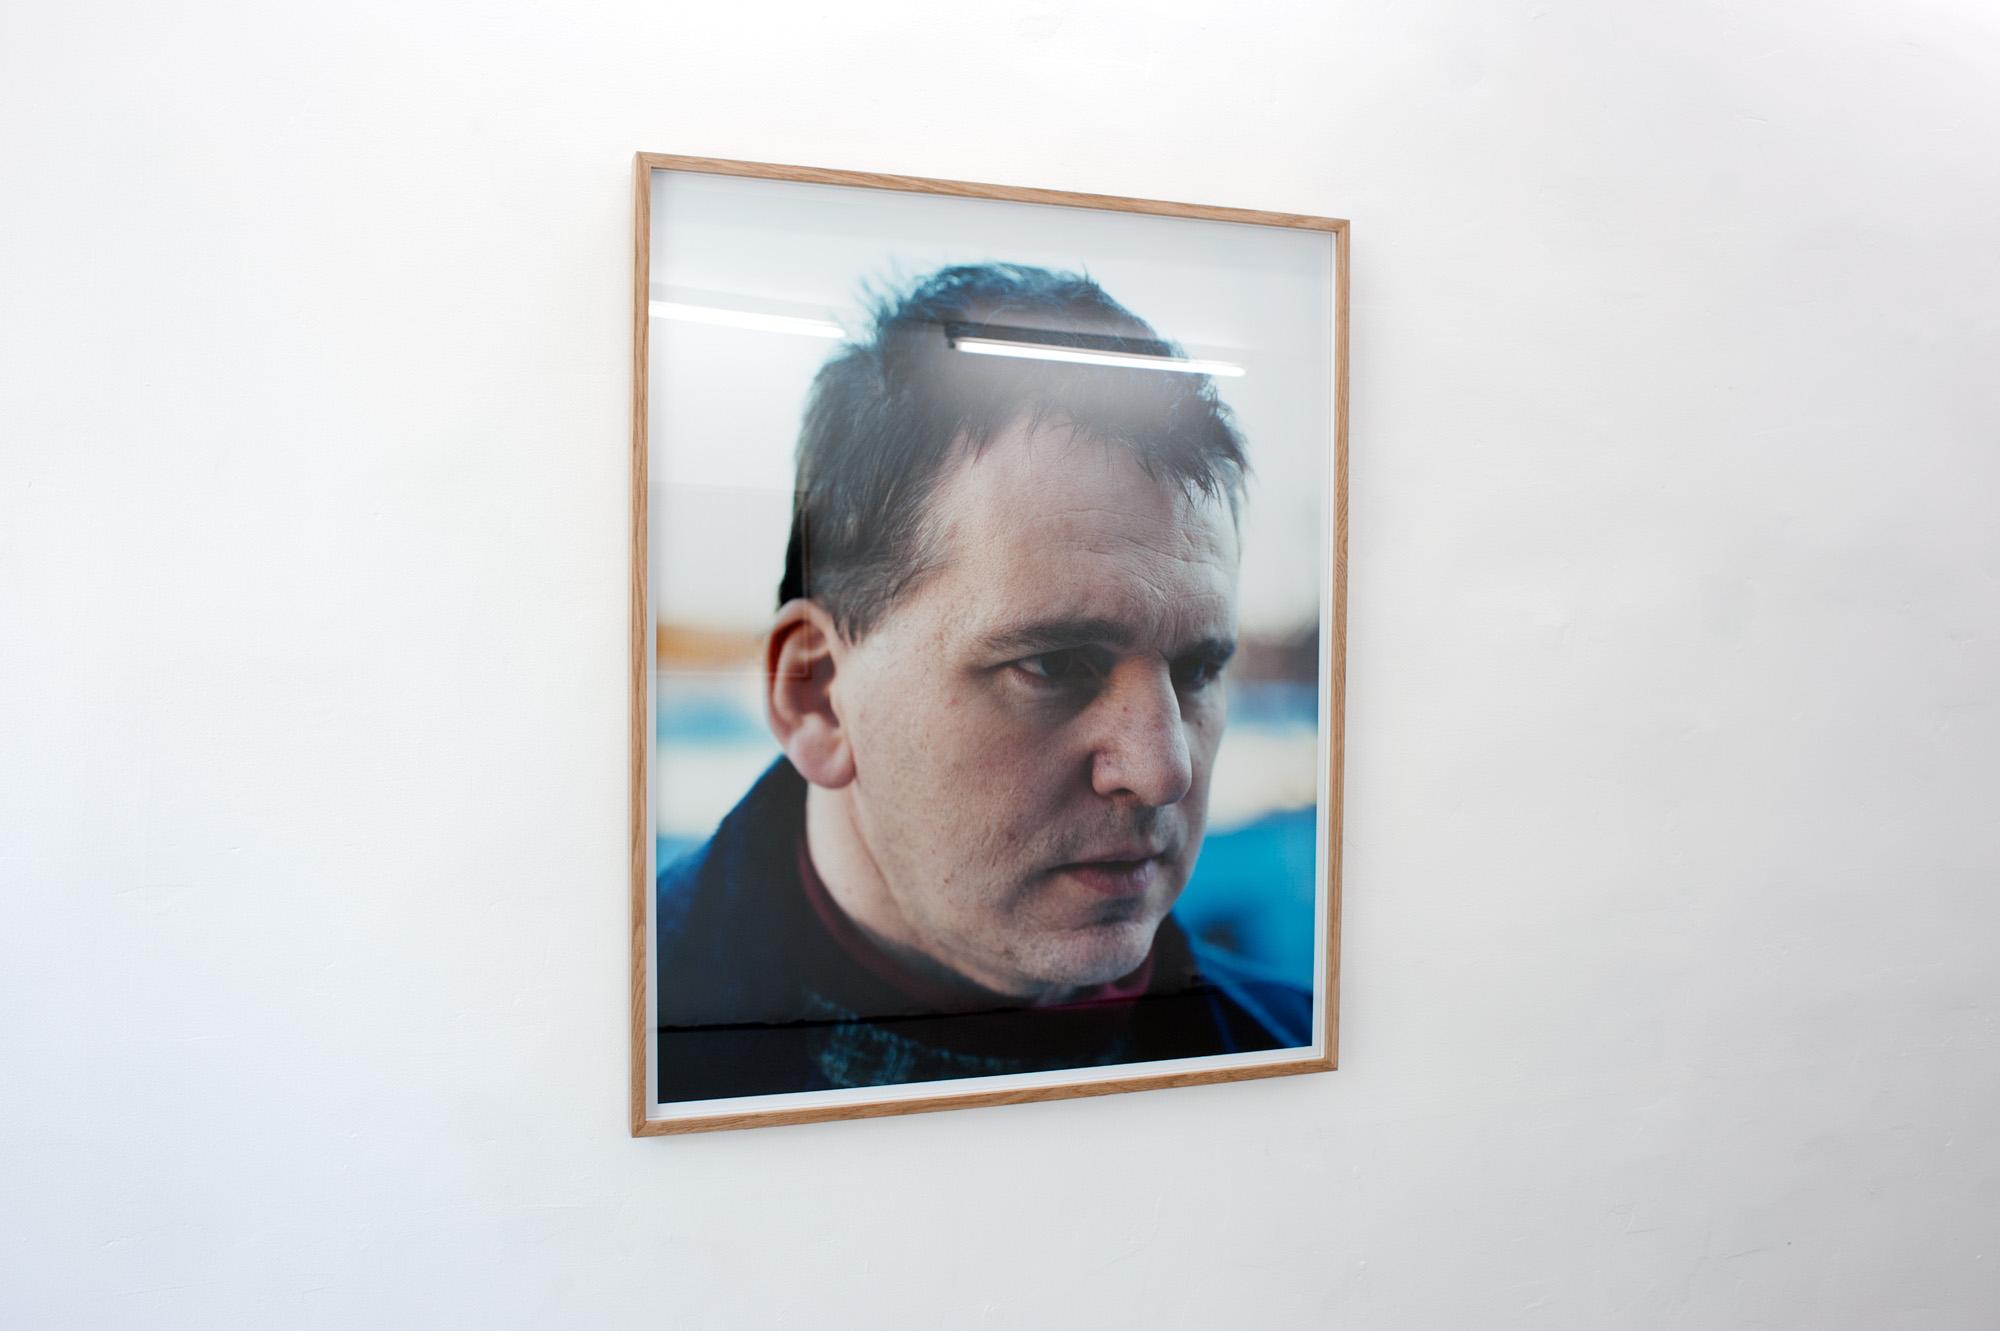 Verena Winkelmann, Hønefoss, 2007, 78 x 65 cm, Installation view MELK 2011